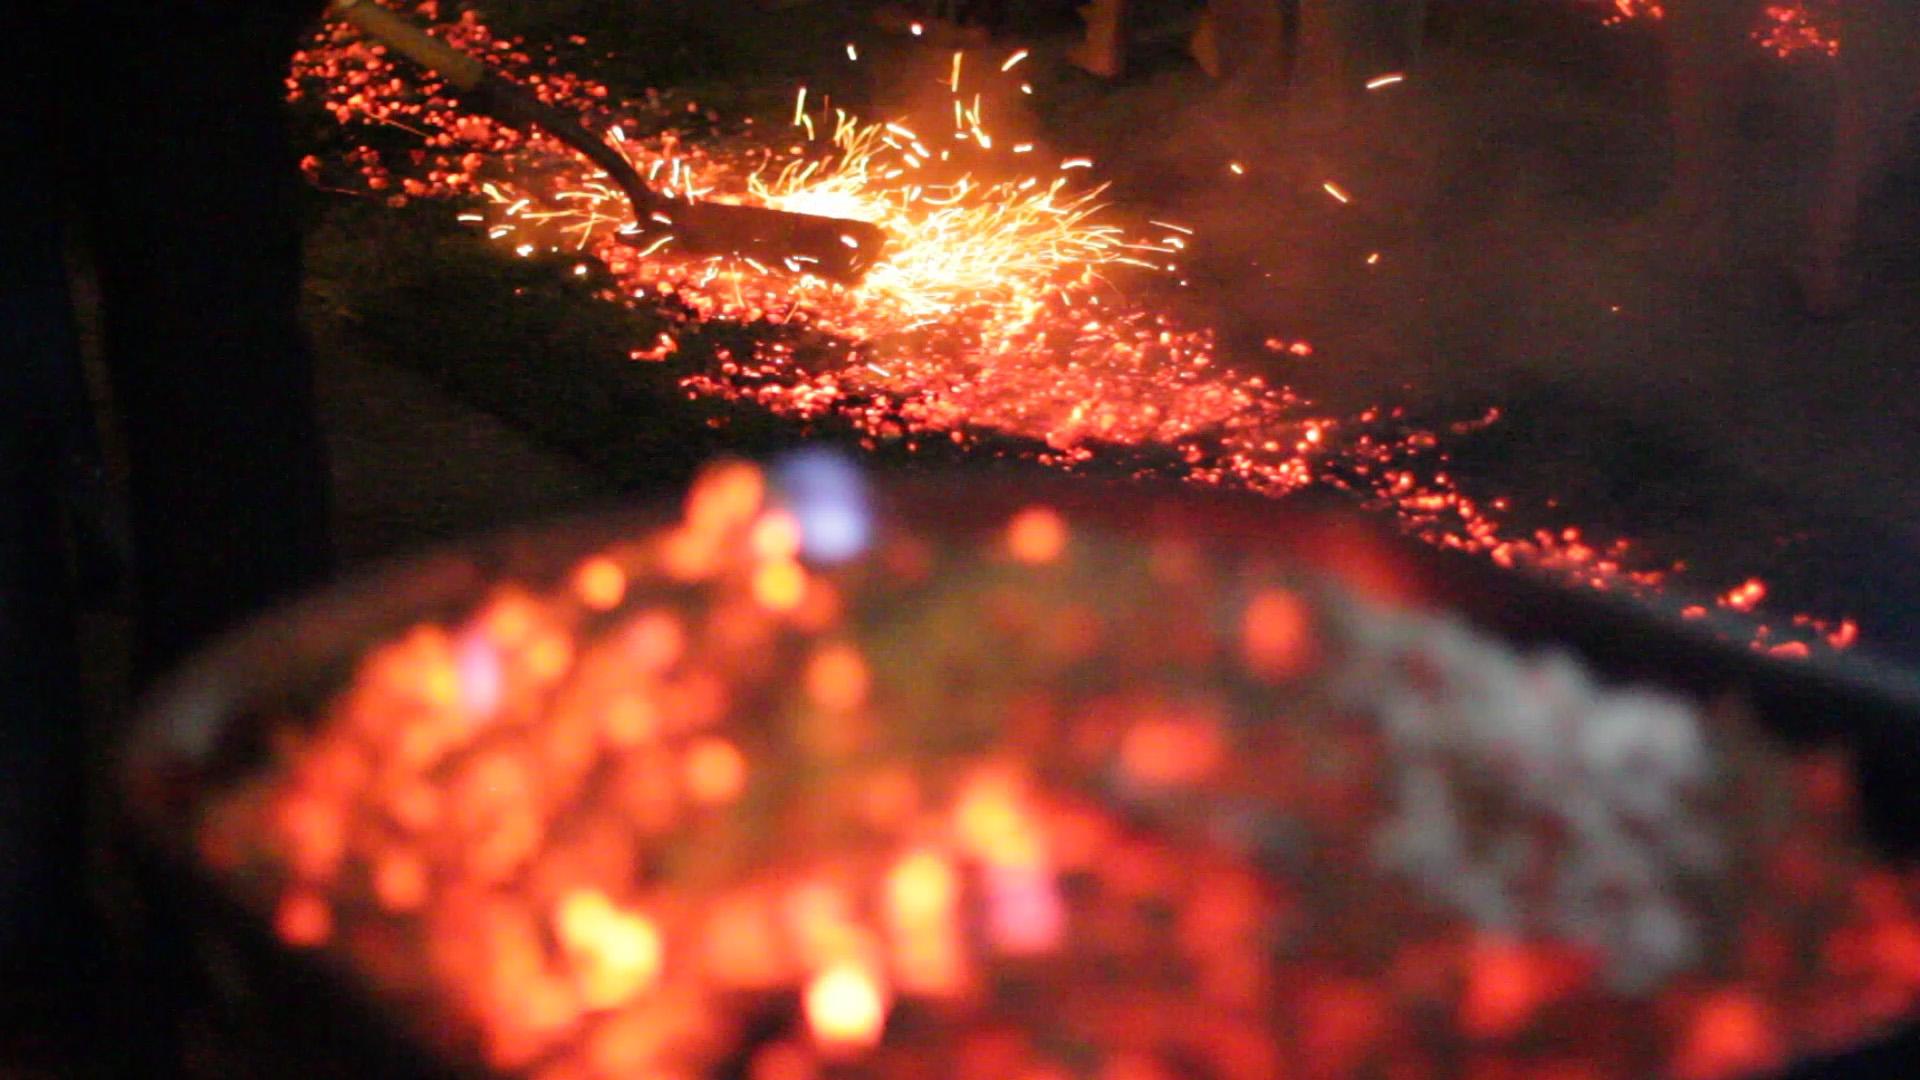 Firewalk on hot coals